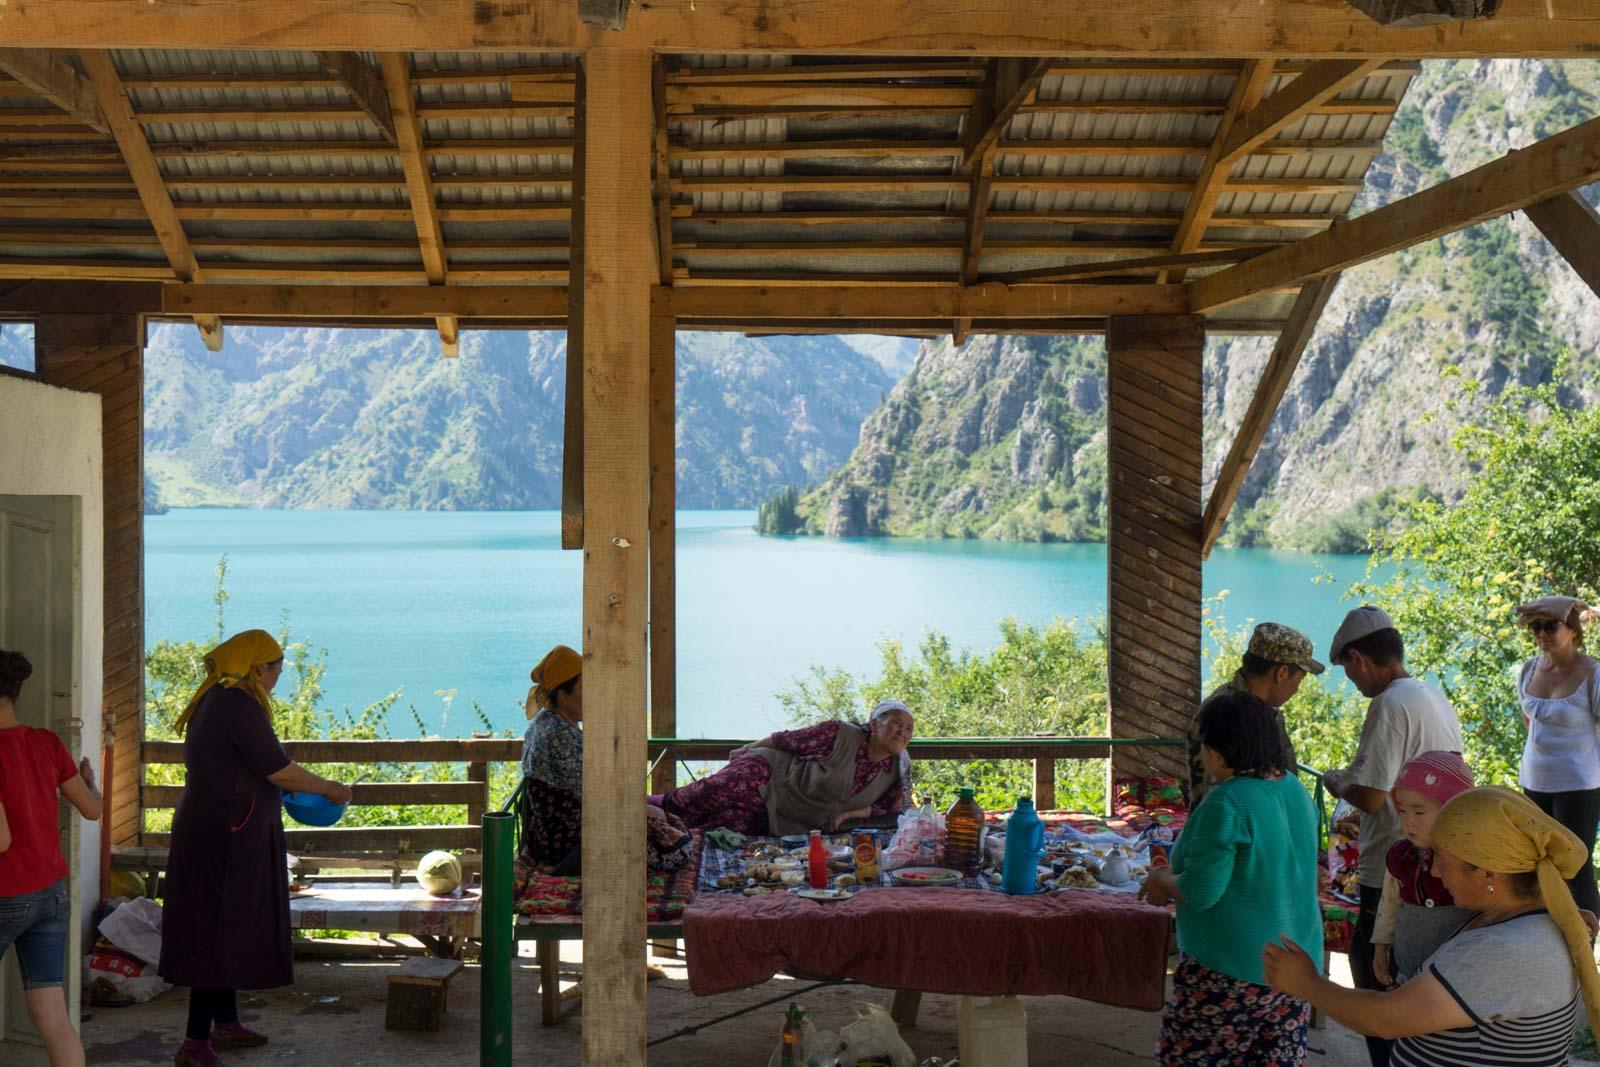 Sary-Chelek Lake, Kyrgyzstan